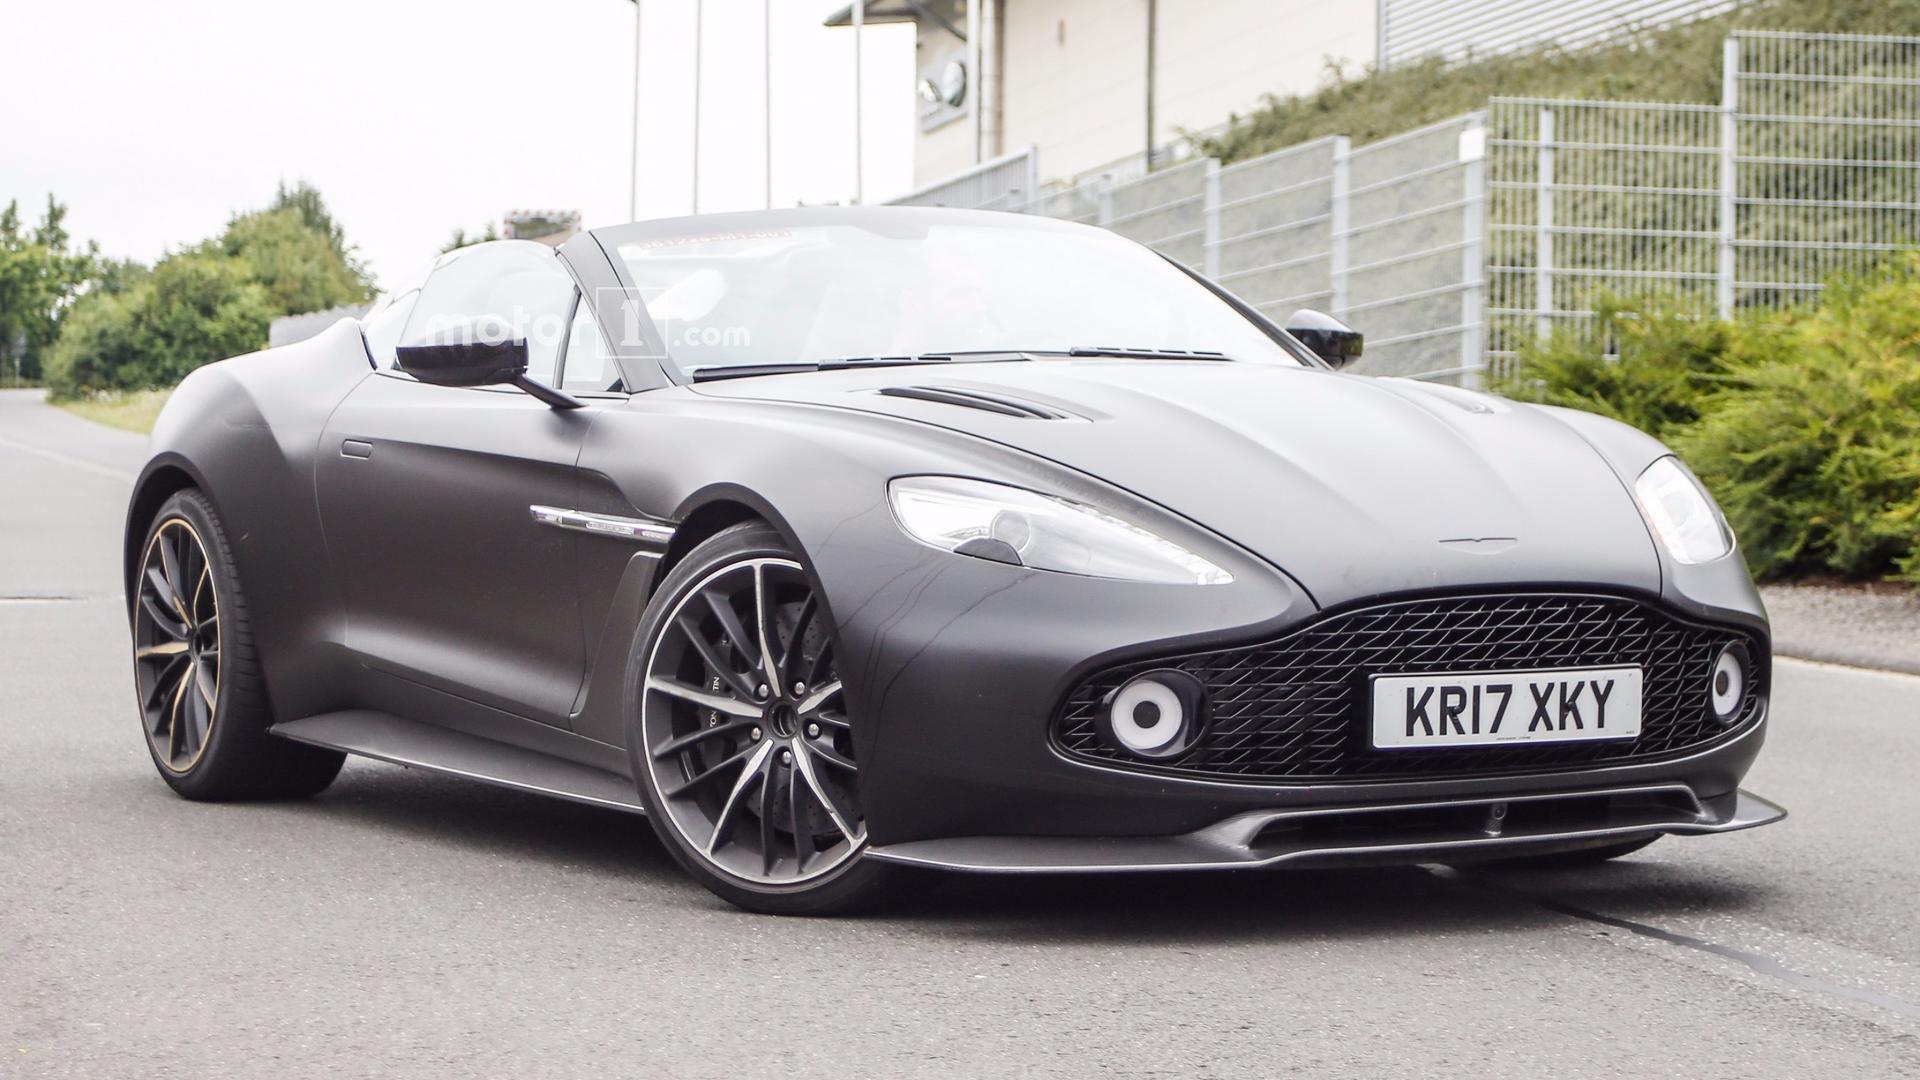 Aston Martin Vanquish Zagato Speedster Spy Photo 2247309